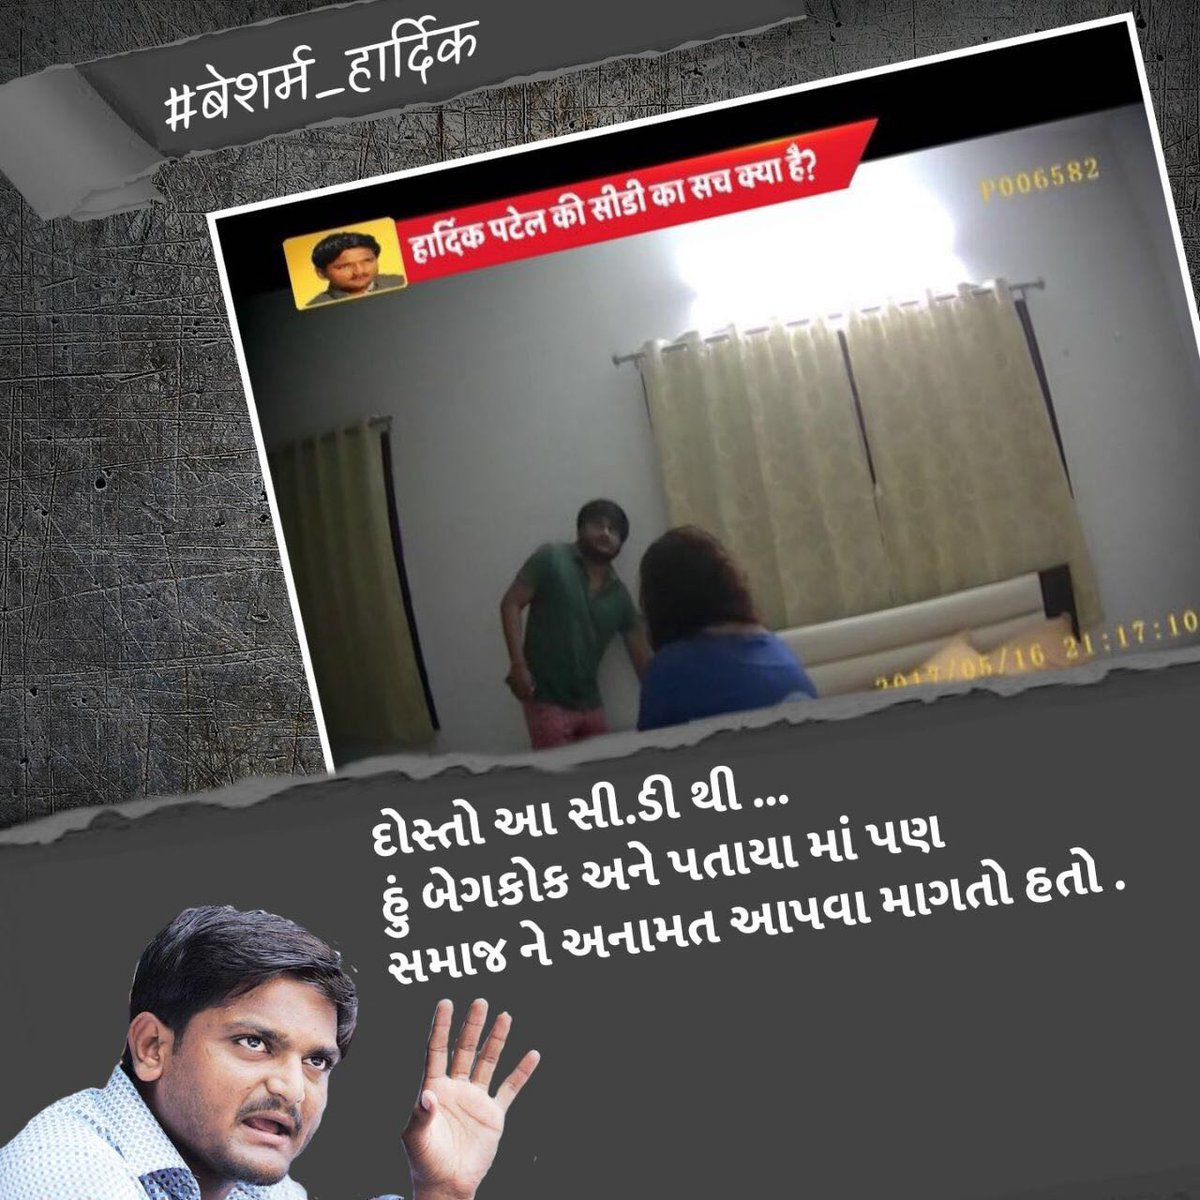 RT @iPankajShukla: Real truth of hardik patel. #HardikExposed https://t.co/SM6sdmABQb